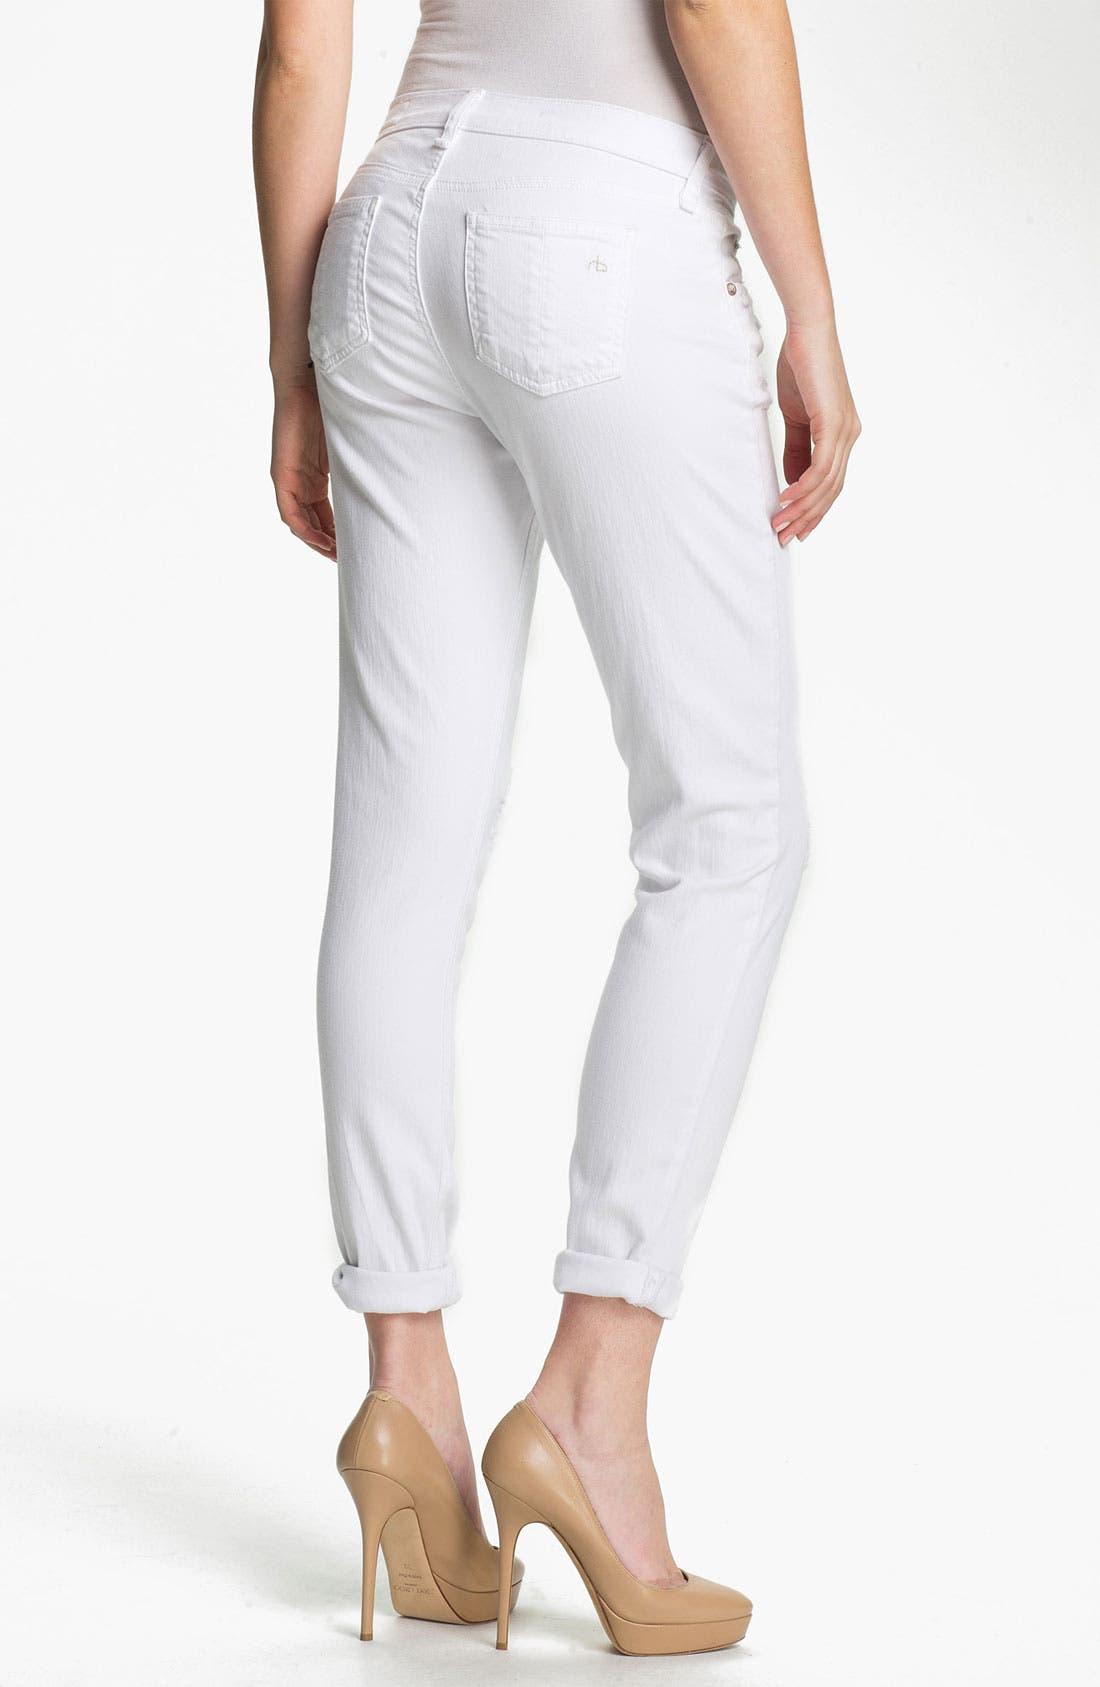 Alternate Image 2  - rag & bone/JEAN 'The Dash' Slouchy Skinny Jeans